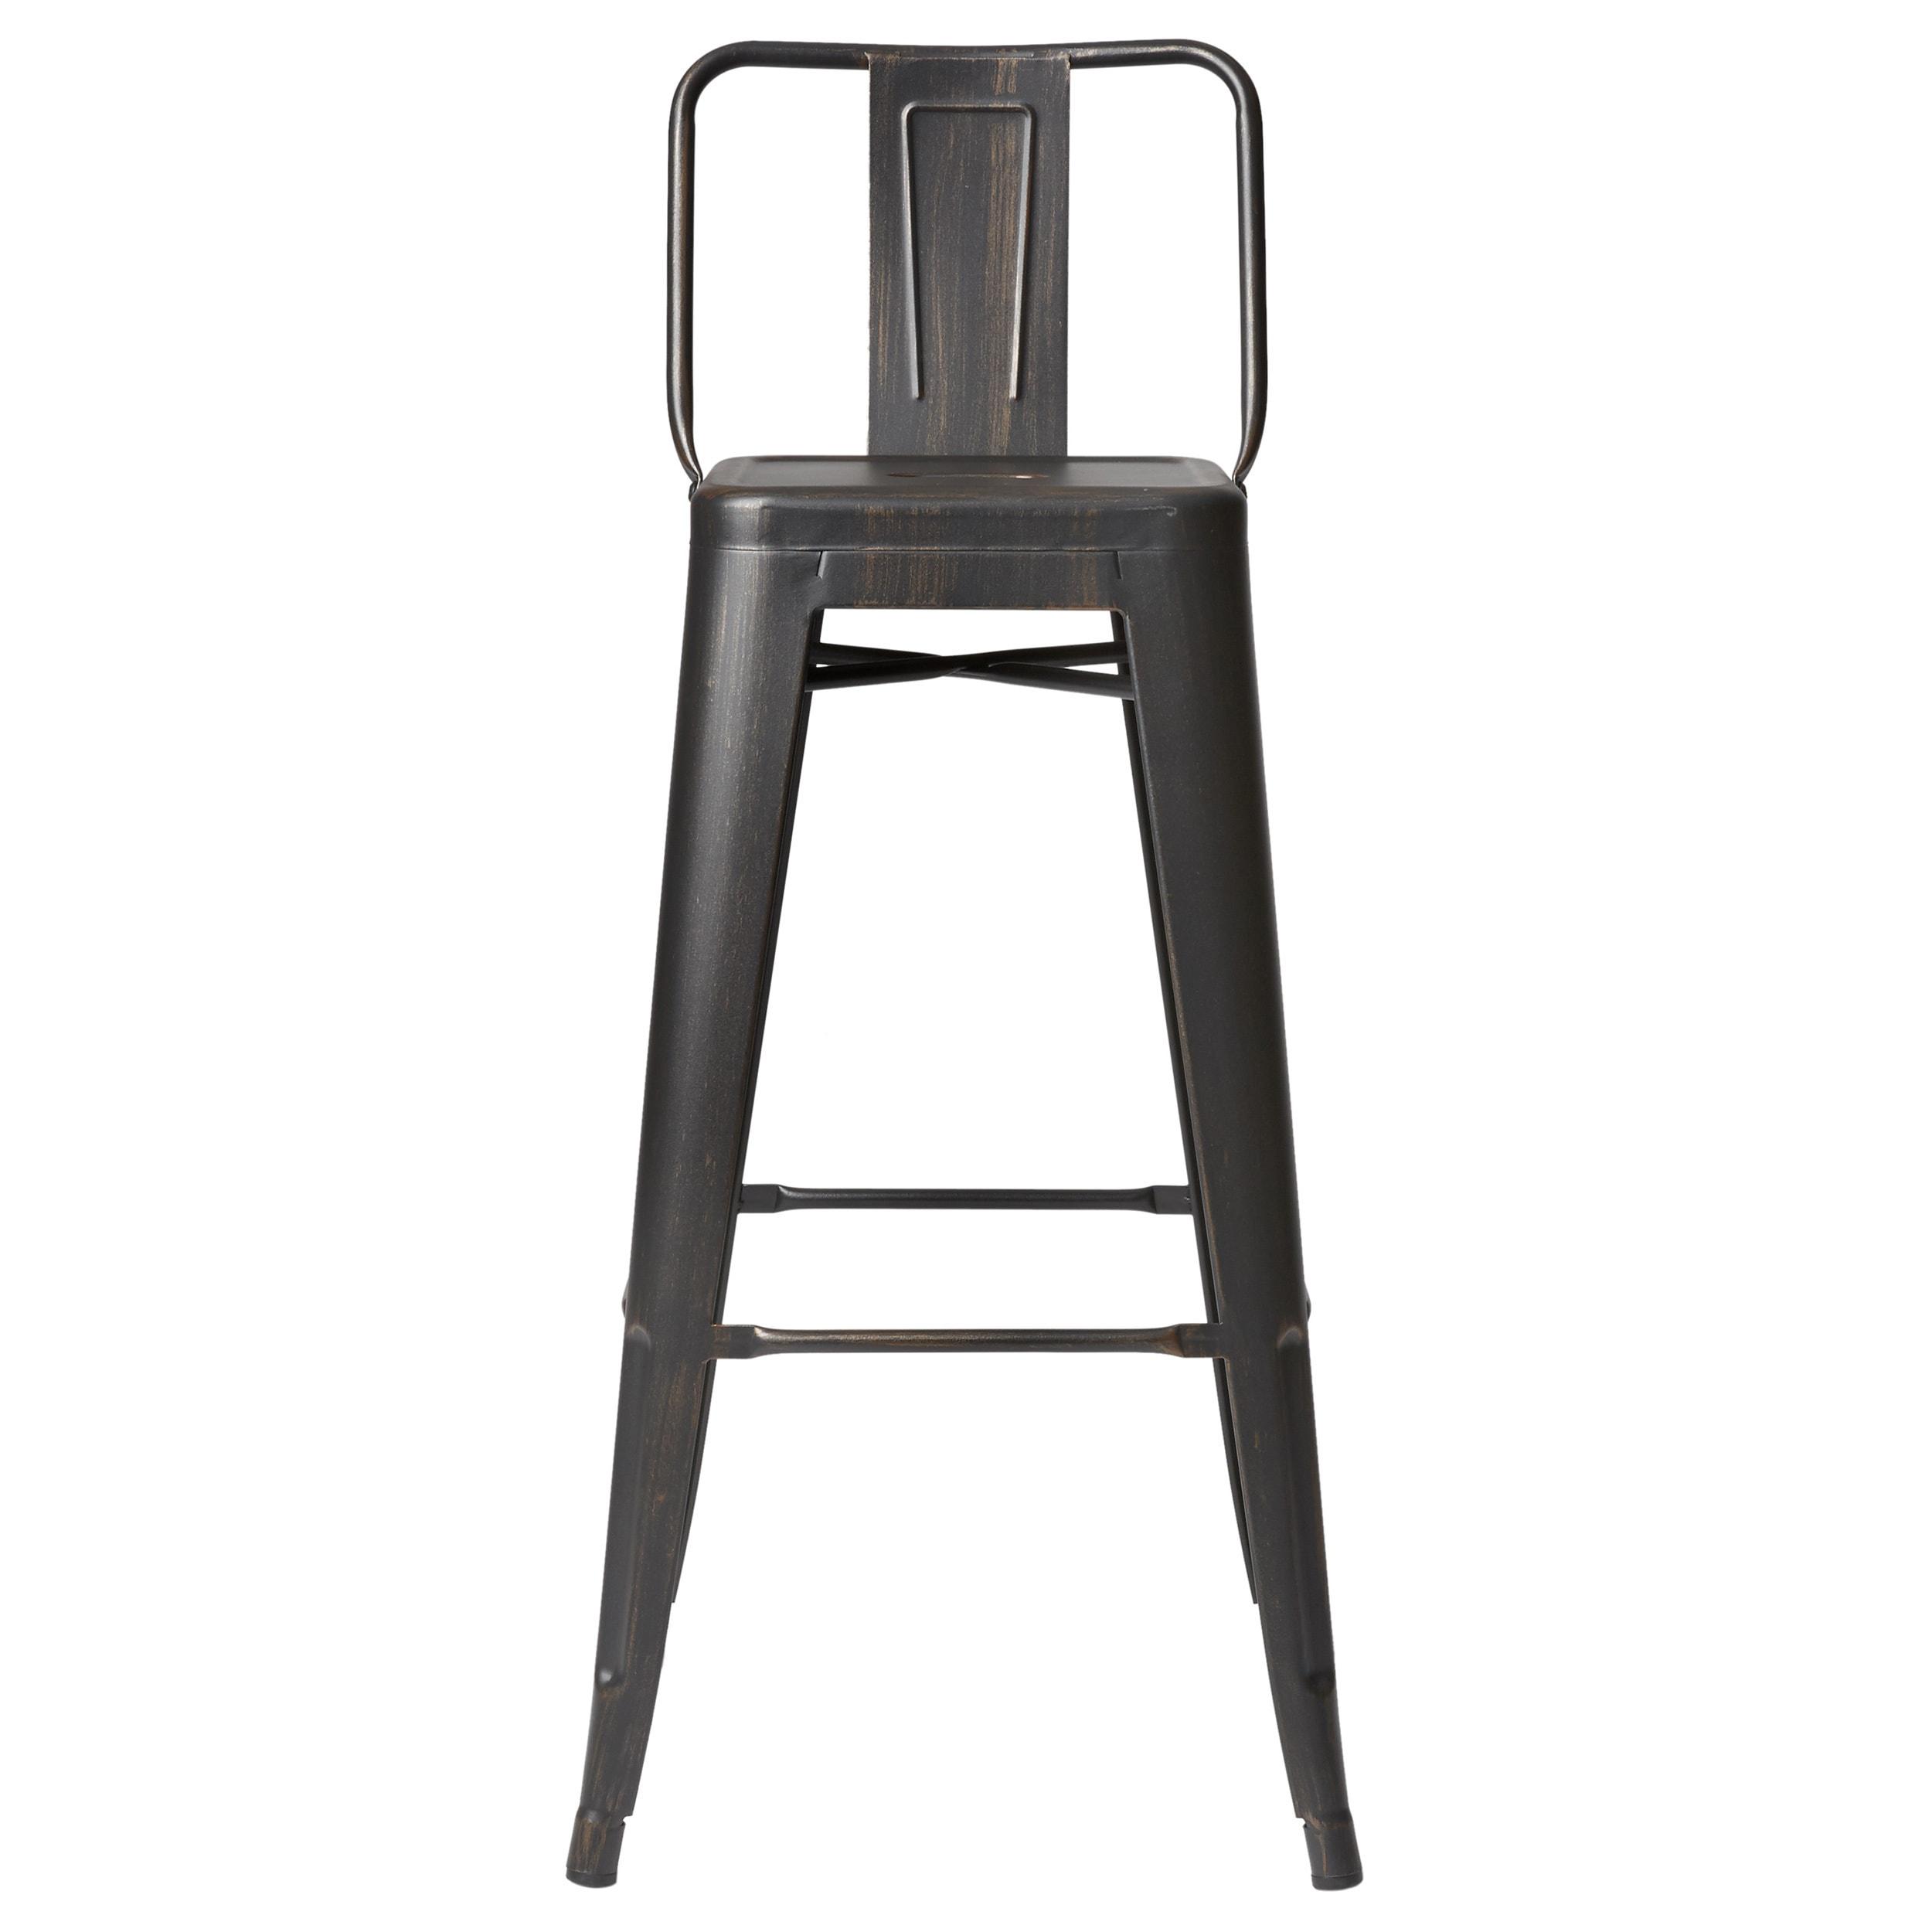 Amazing Carbon Loft Ruska Steel 30 Inch Bar Stool Set Of 2 Andrewgaddart Wooden Chair Designs For Living Room Andrewgaddartcom